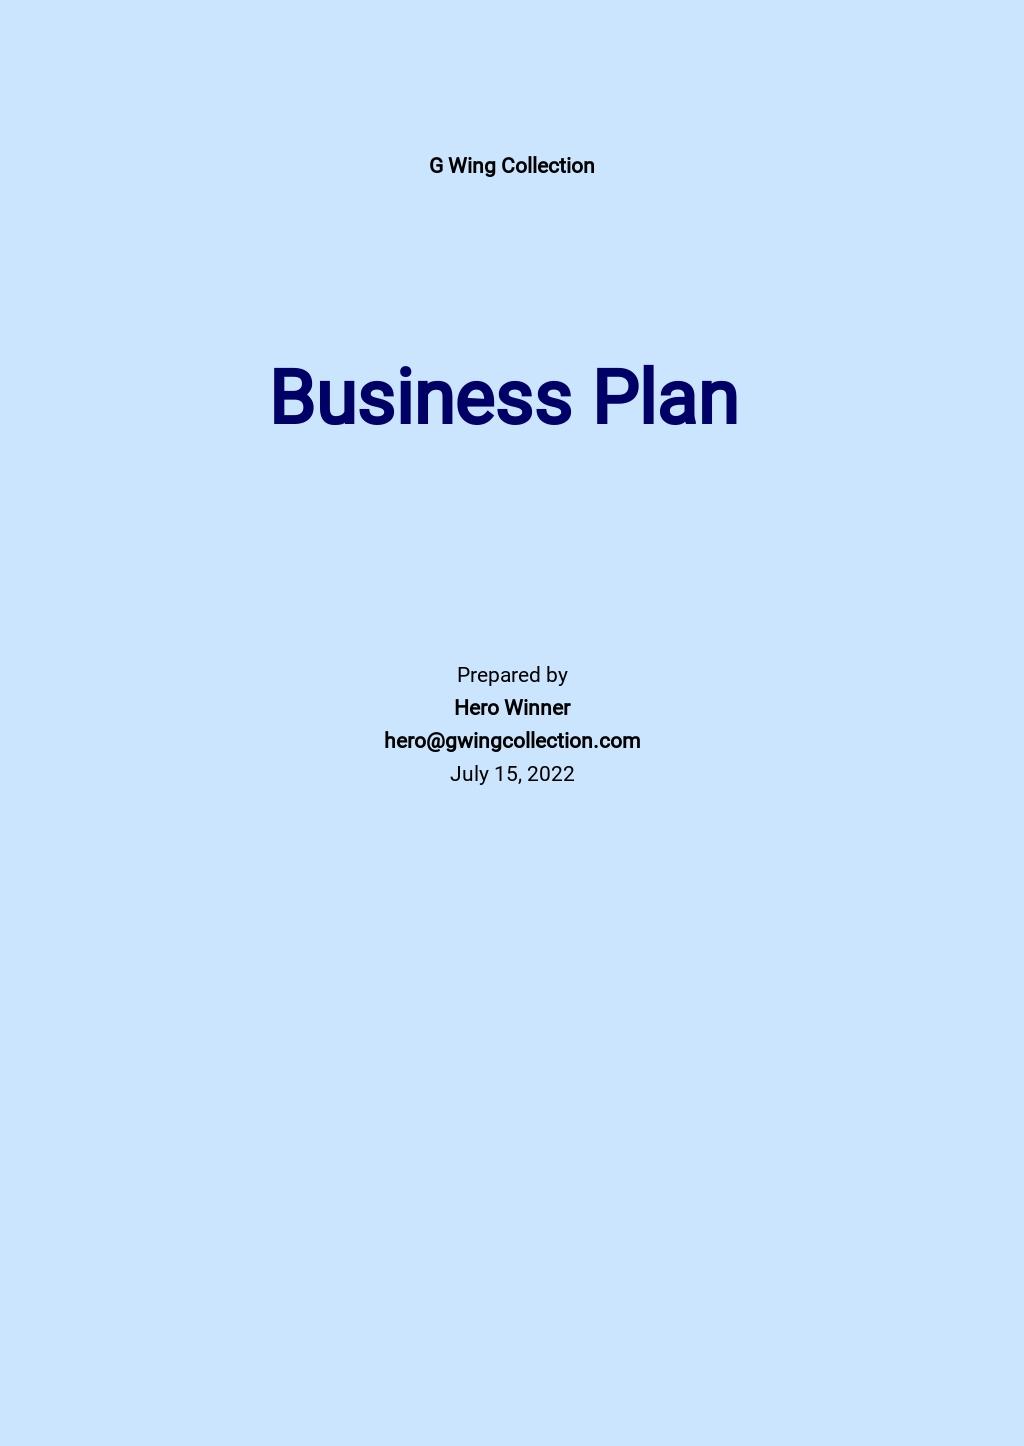 T-Shirt Company Business Plan Template